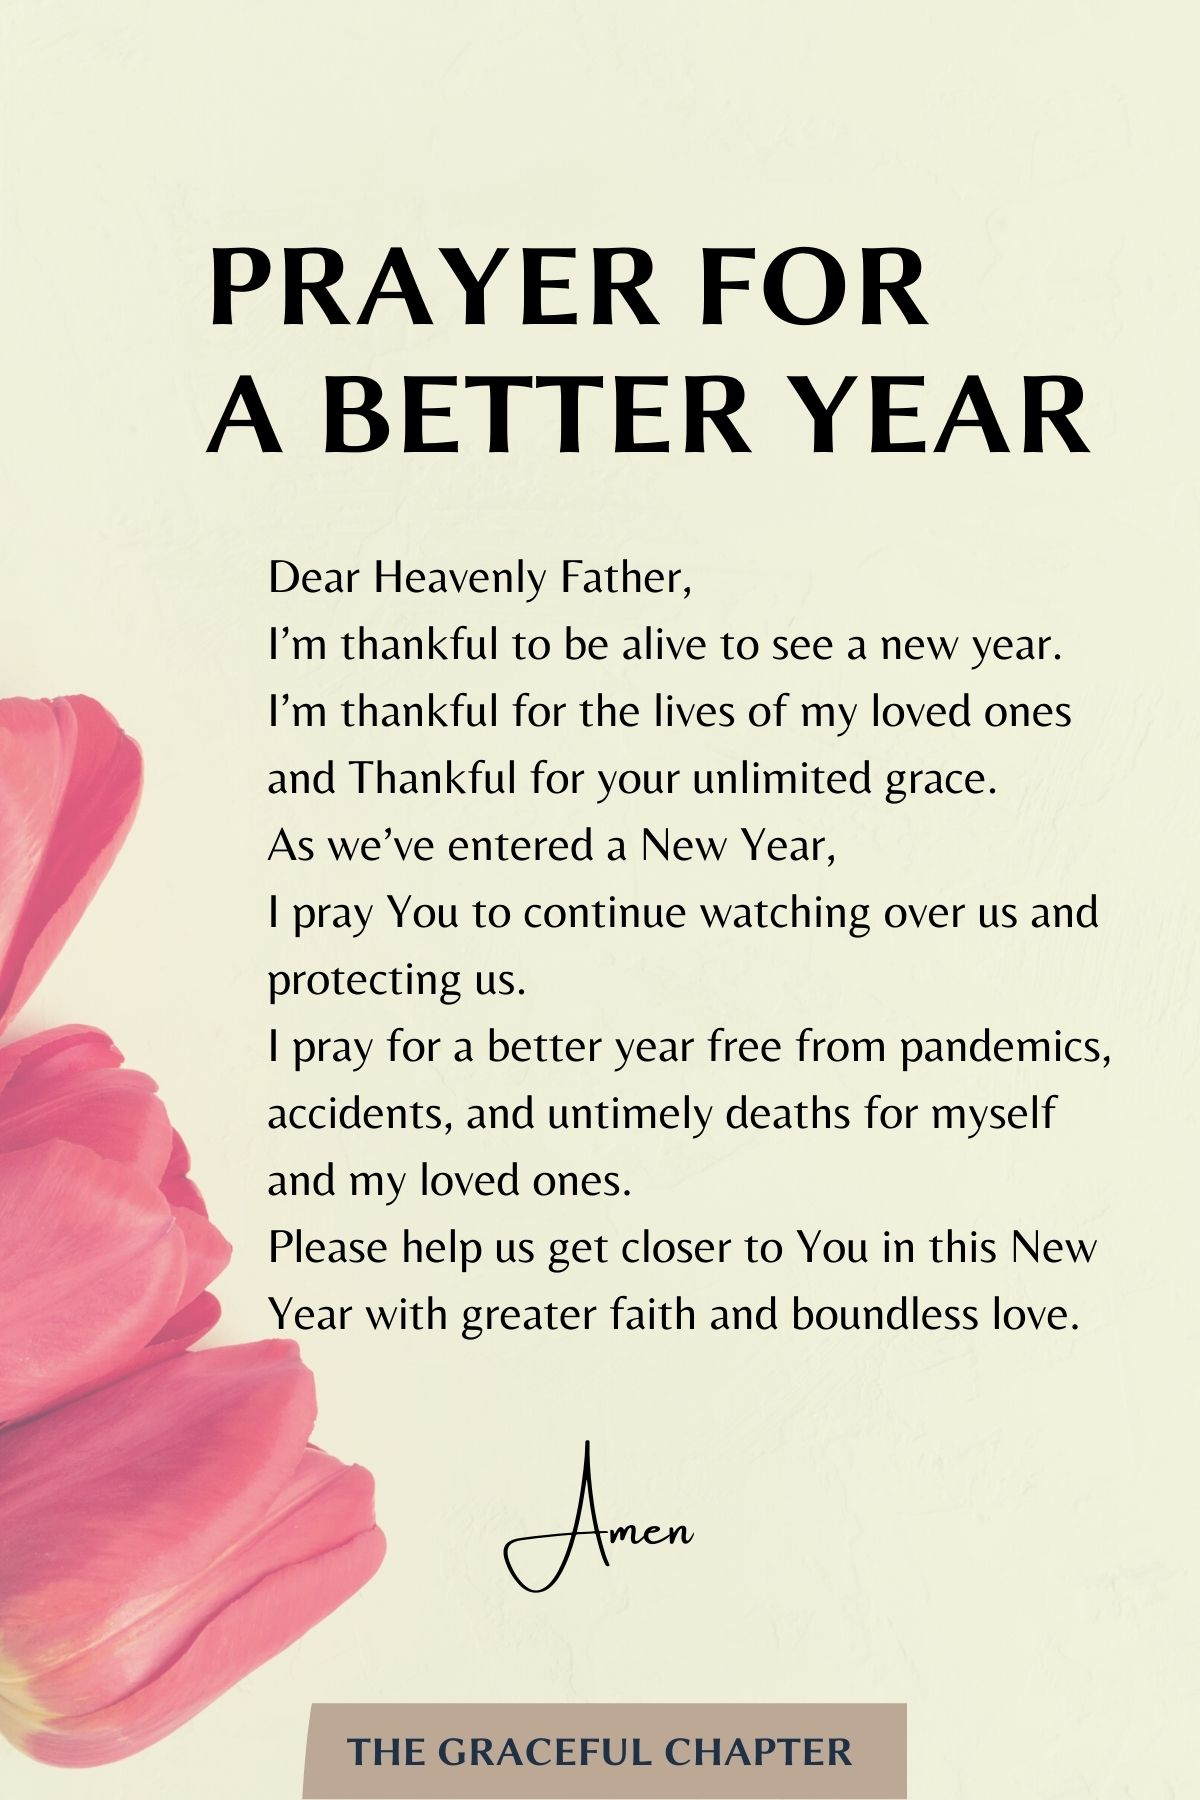 Prayer for a better year